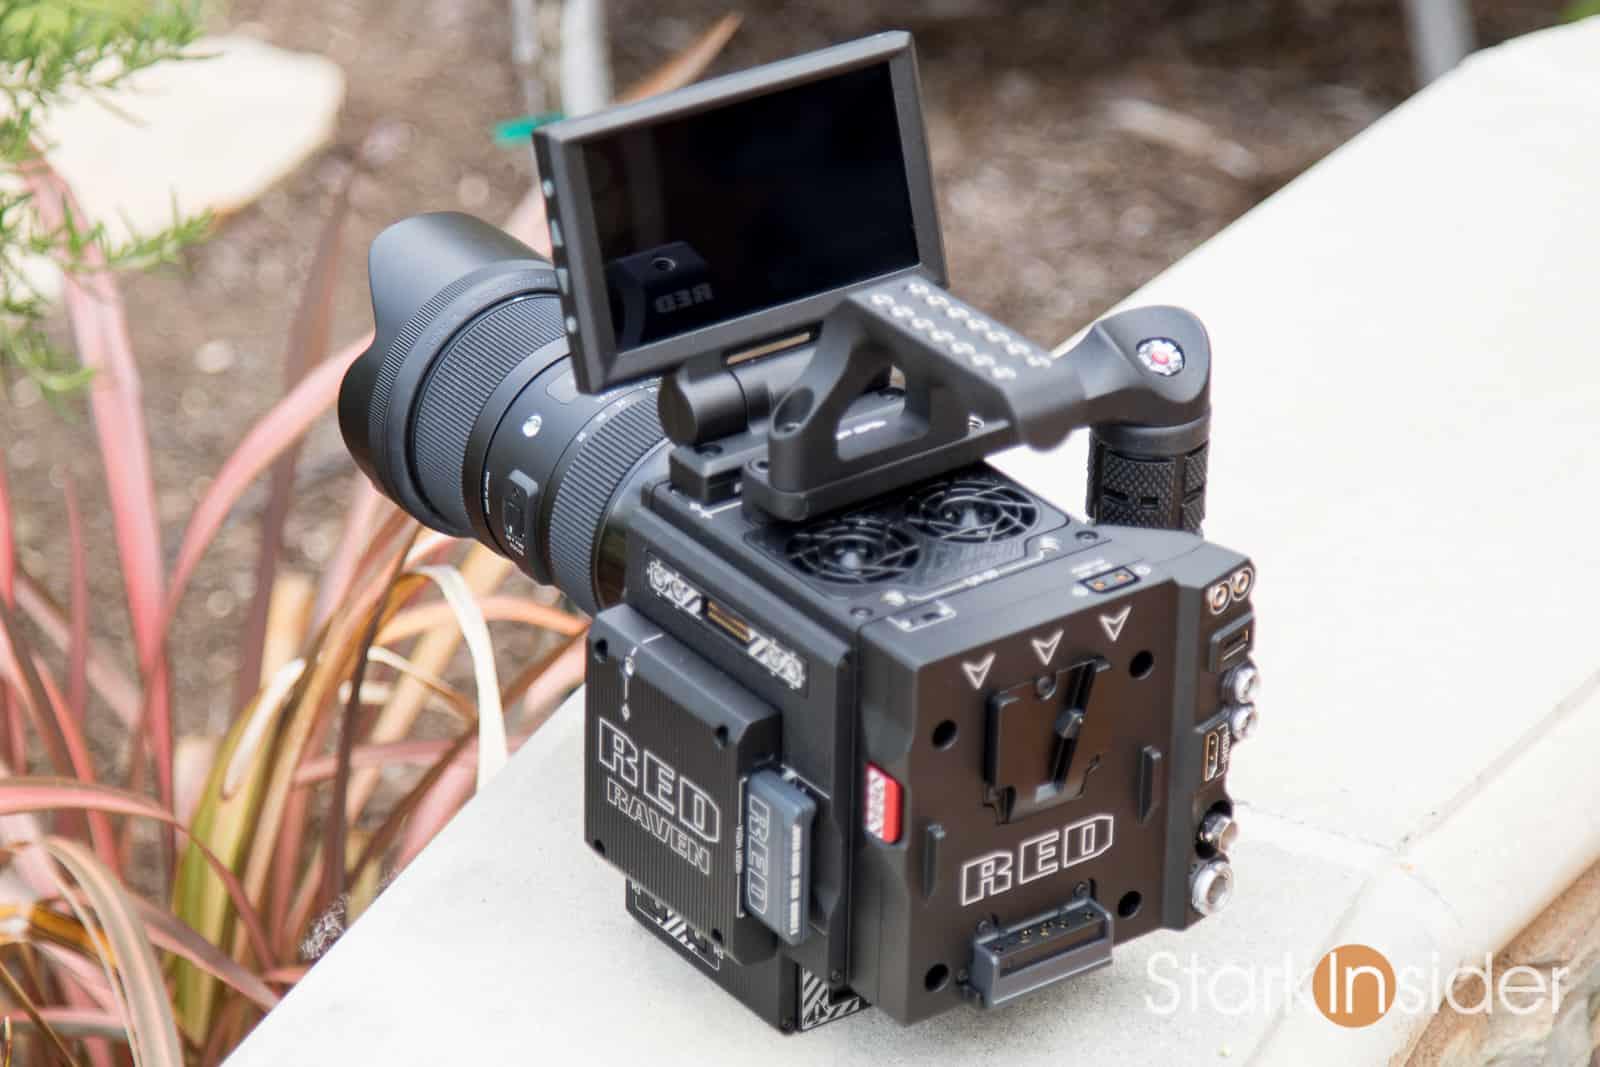 RED-Raven-Camera-Unboxing-Stark-Insider-8742